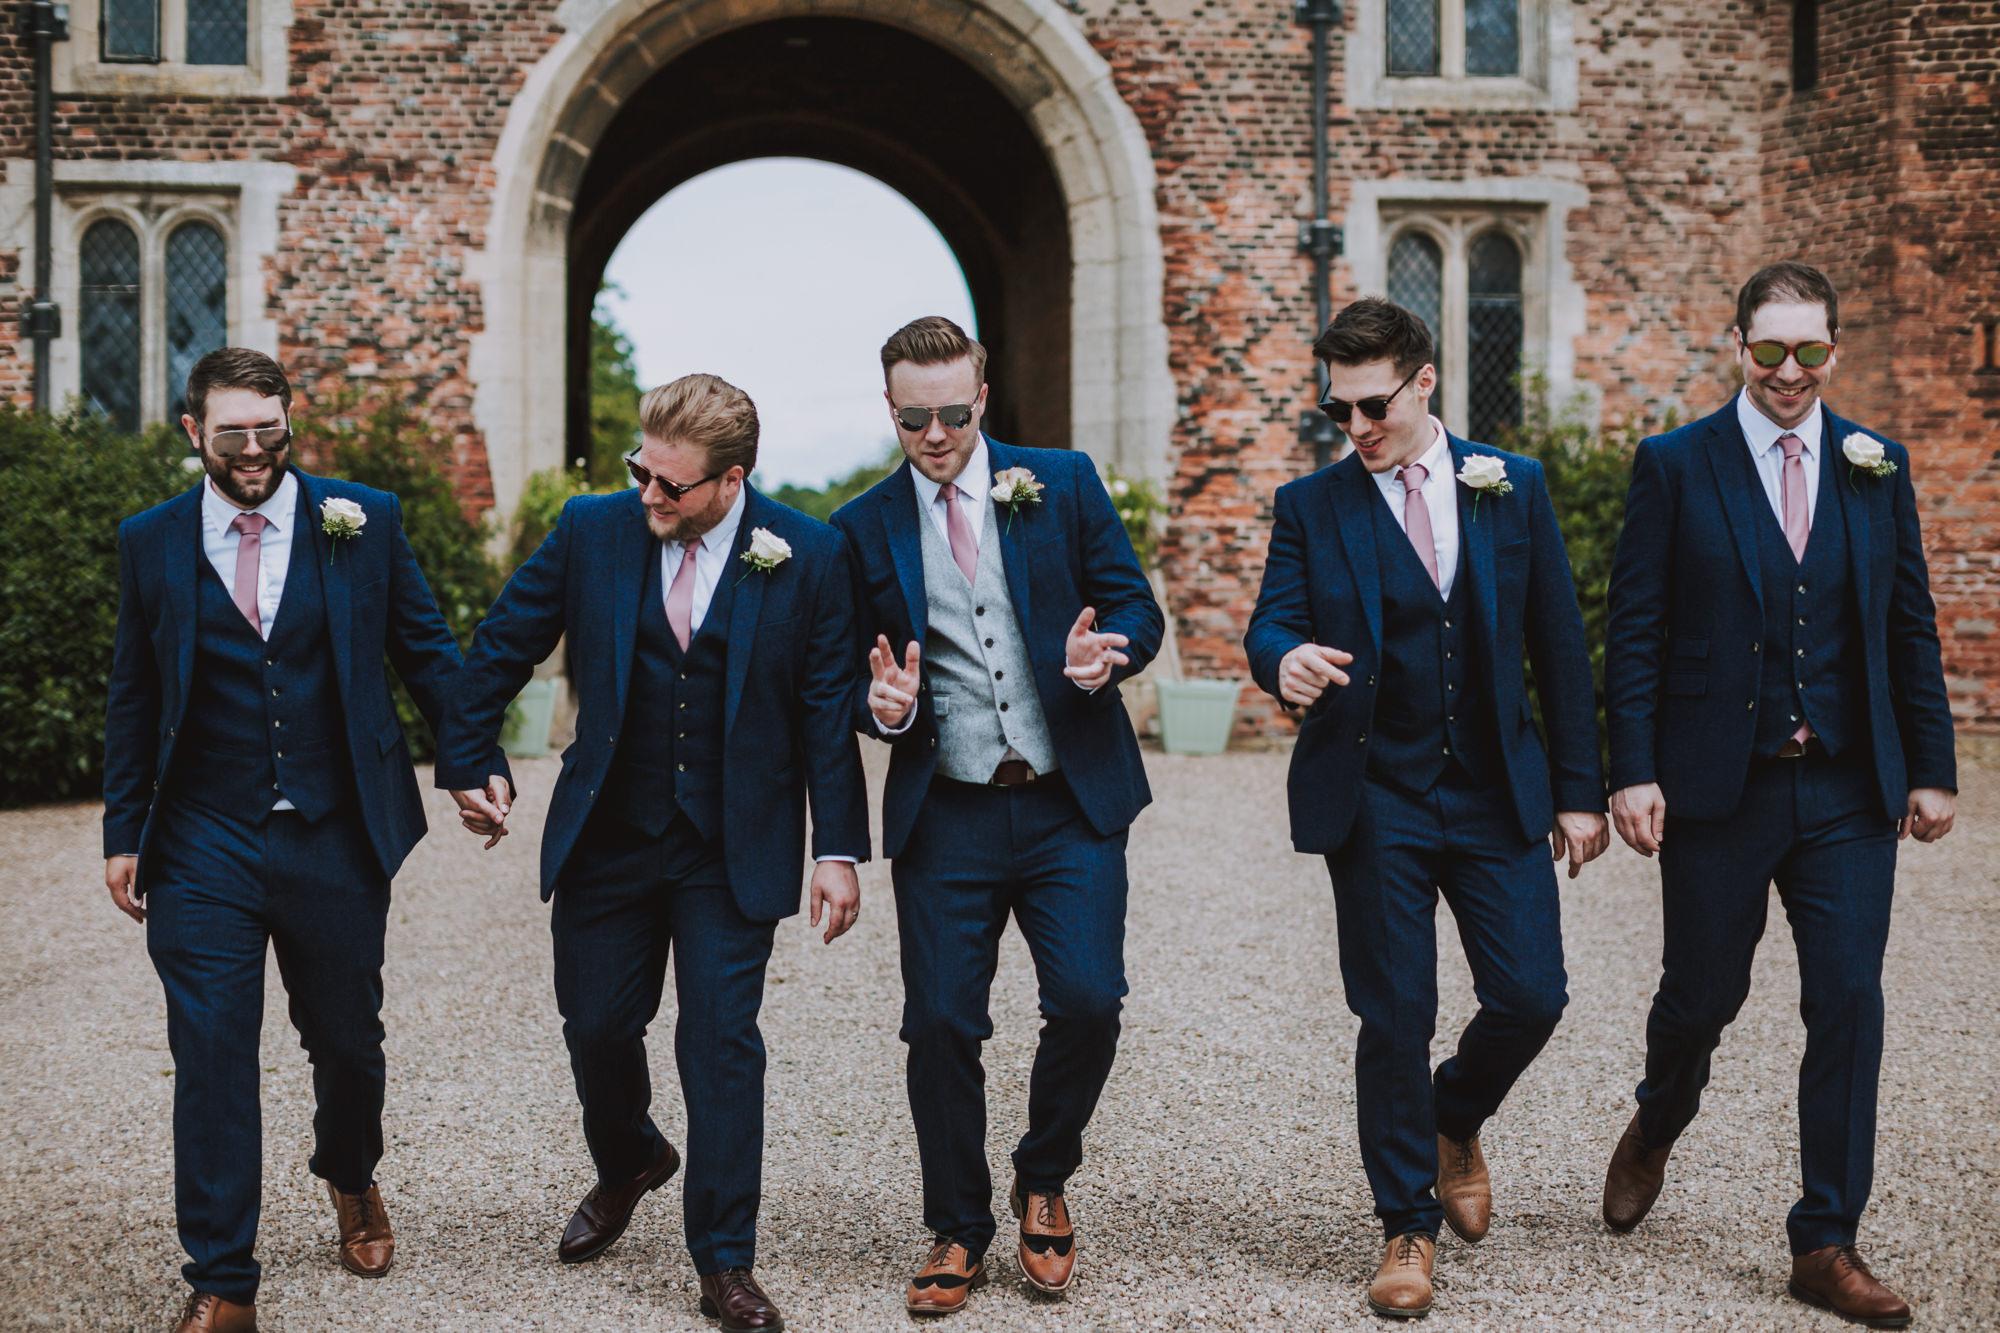 hodsock priory wedding photographers blog18.jpg